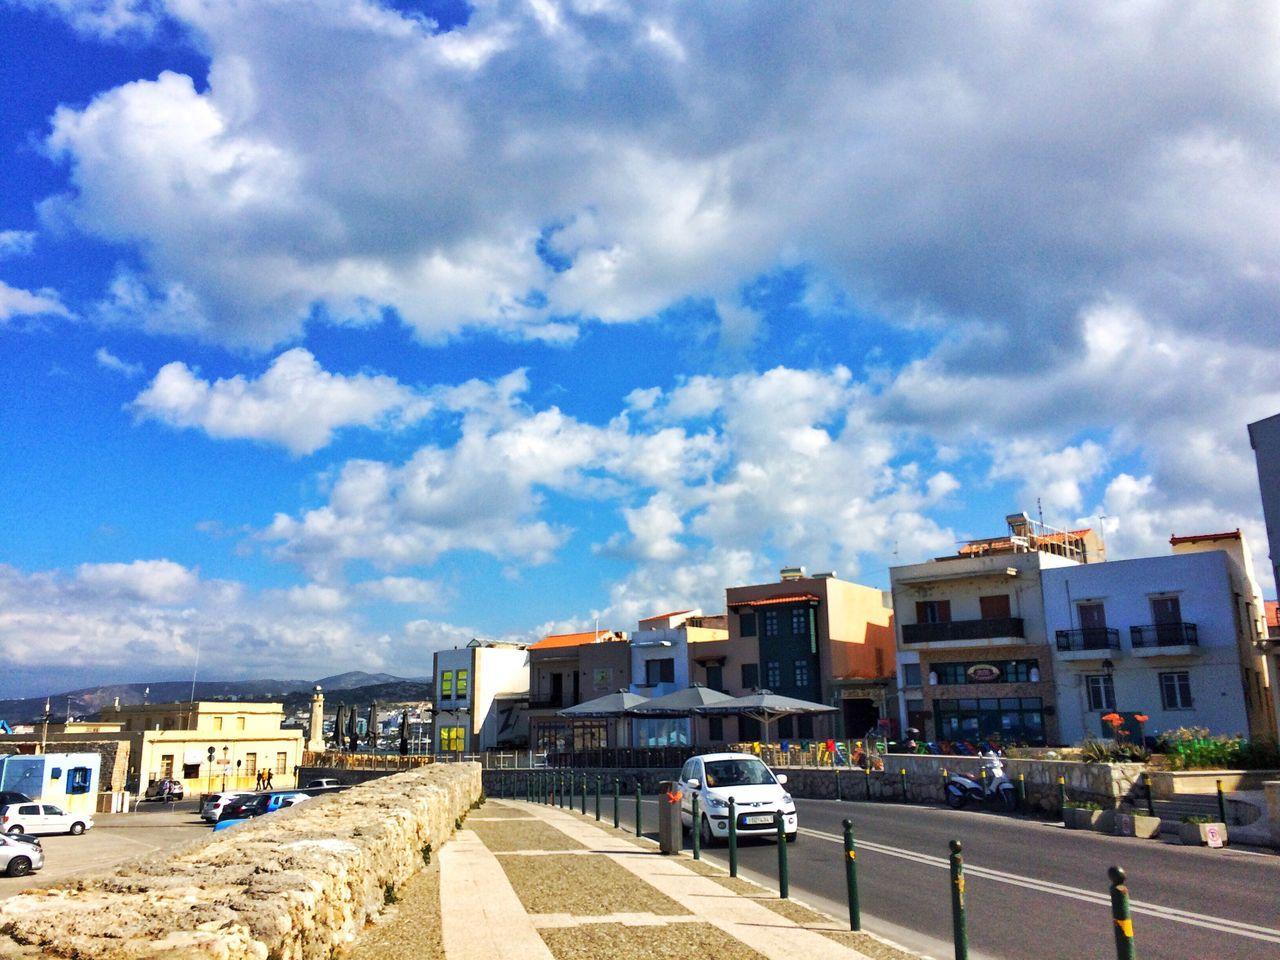 architecture, building exterior, cloud - sky, sky, built structure, car, day, outdoors, land vehicle, city, transportation, blue, road, no people, cityscape